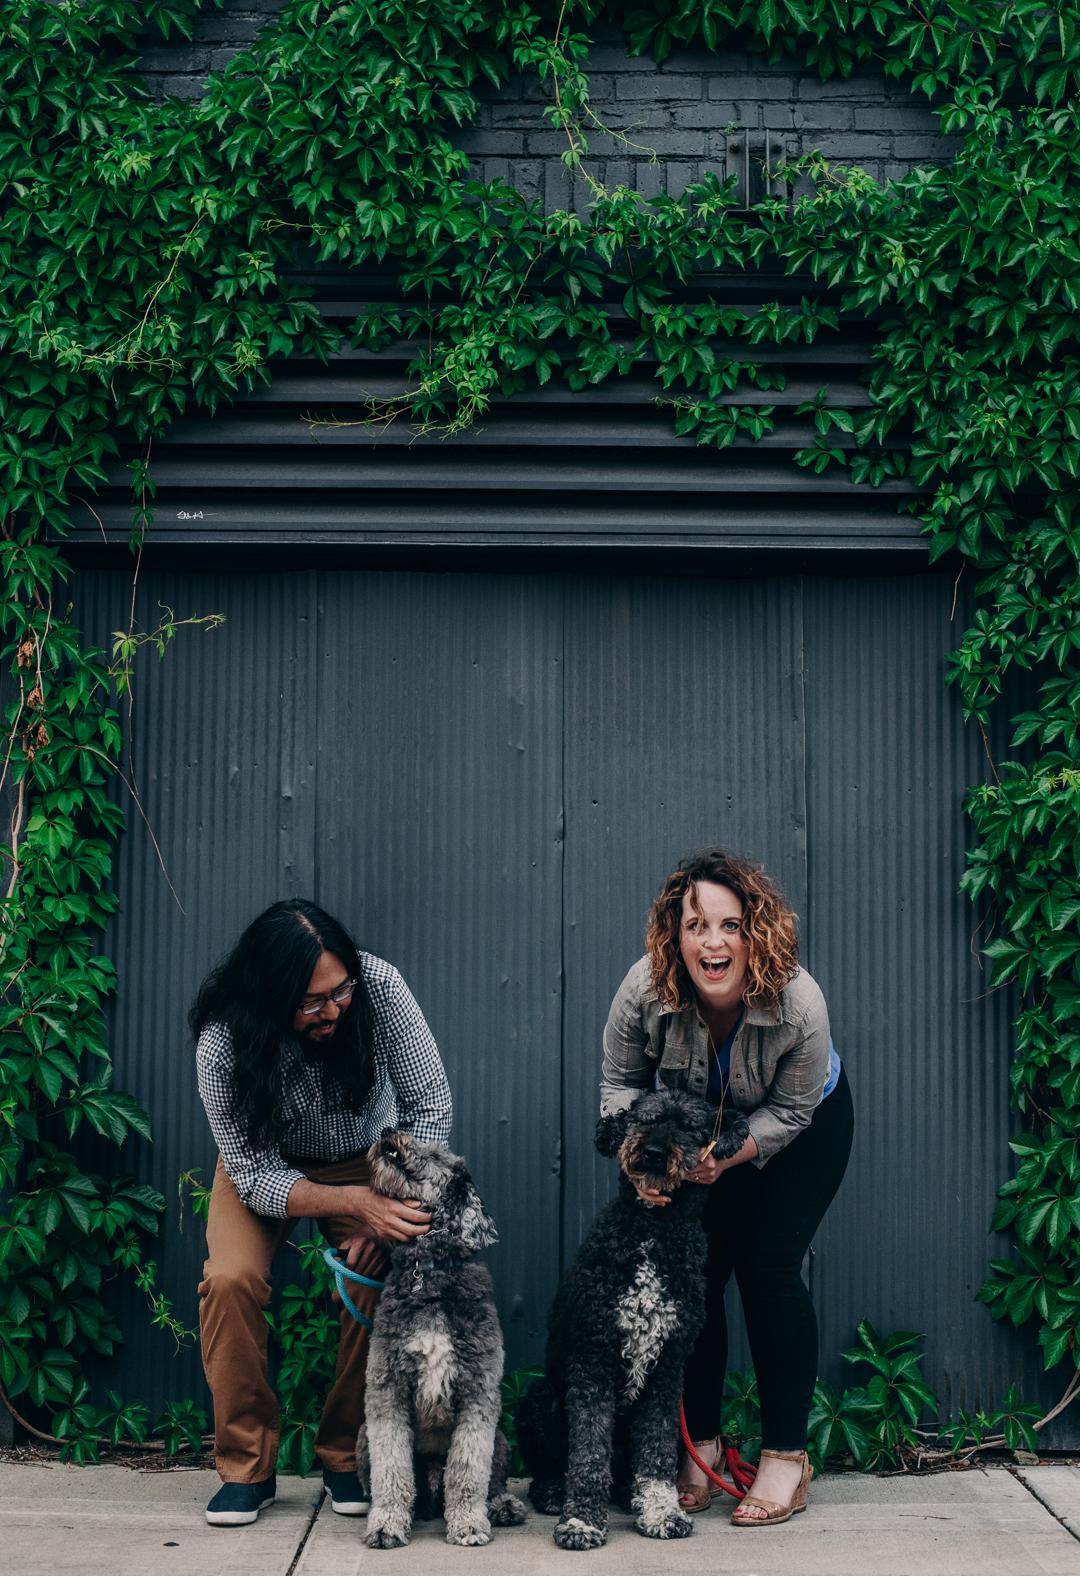 TerraSuraPhotography-Holly RIcky Engagement-Web-0102.jpg